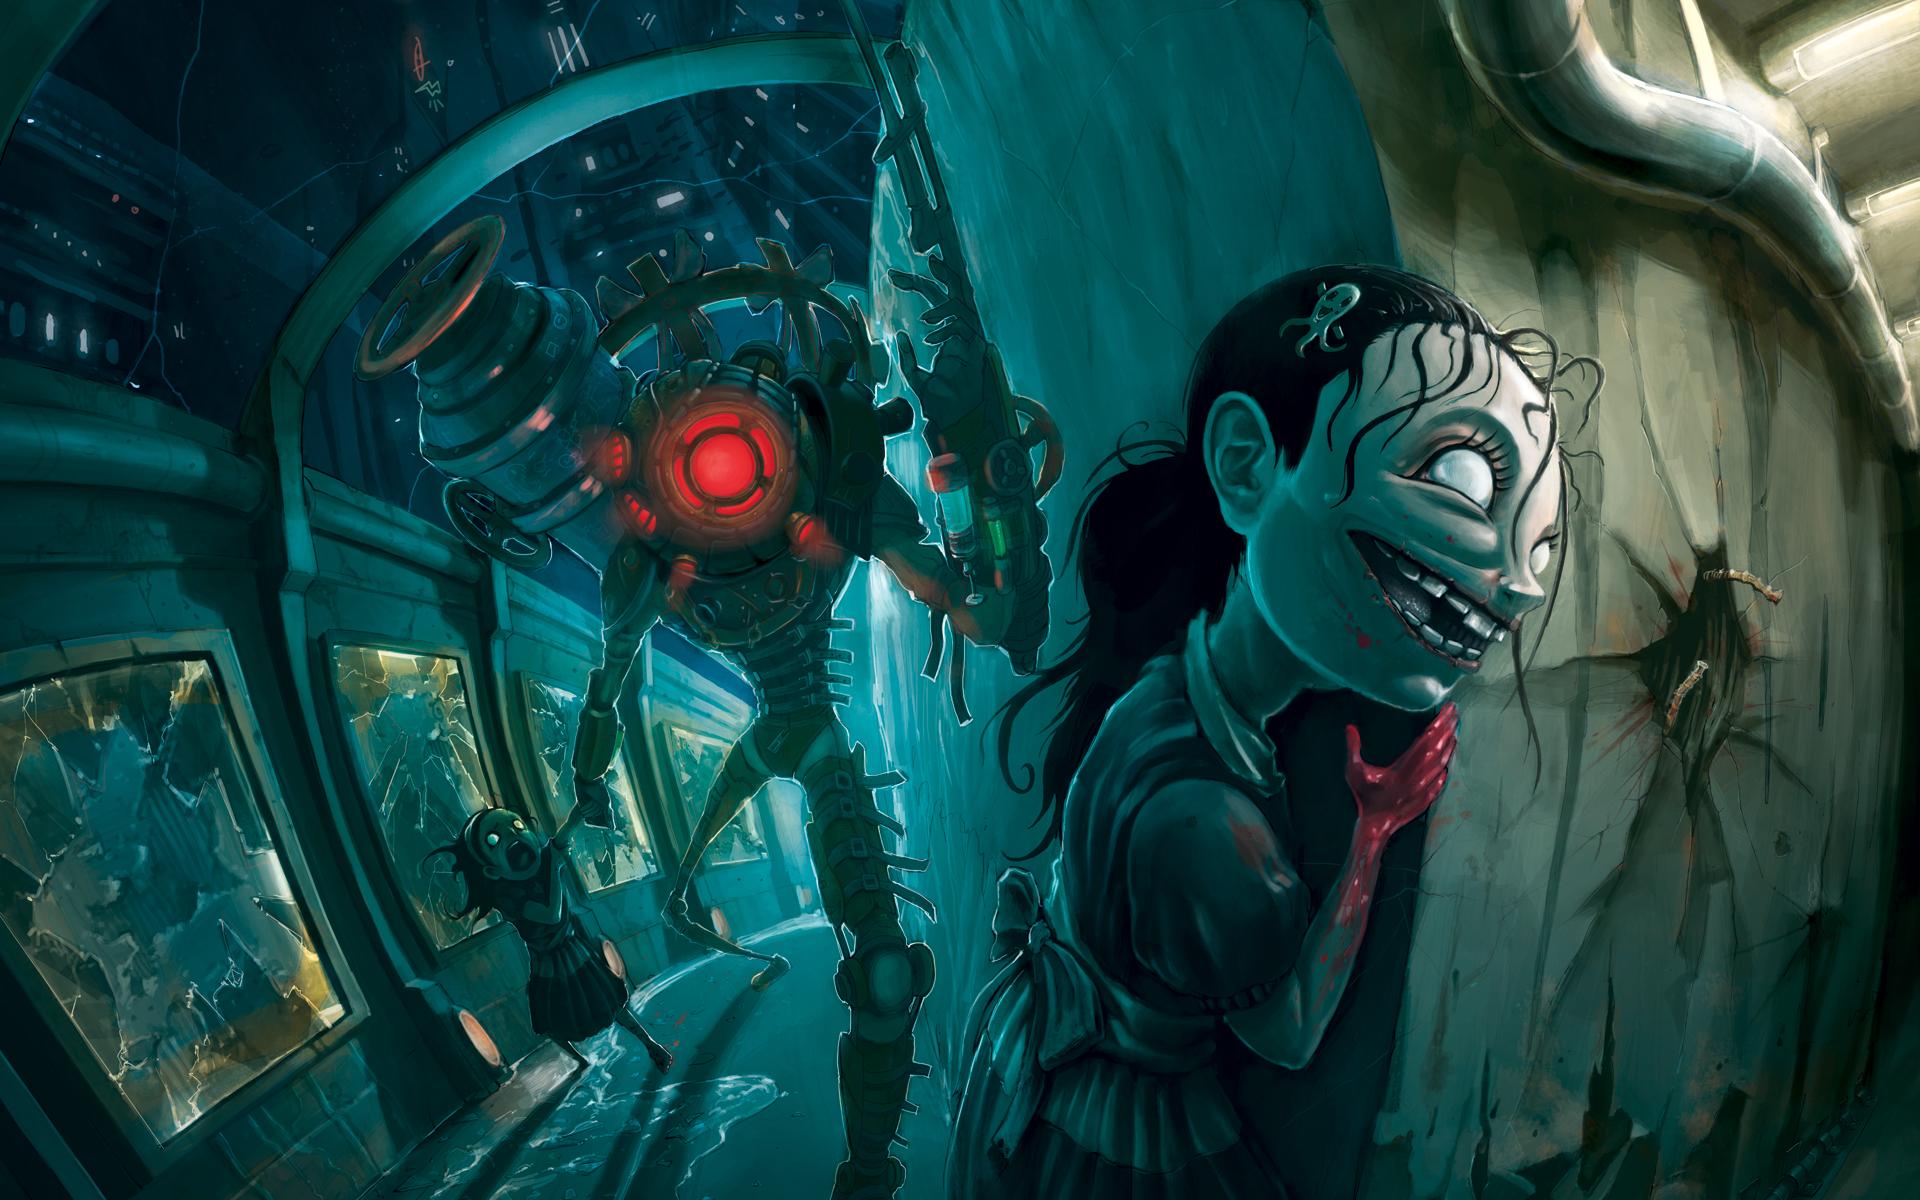 Wallpaper 1 Wallpaper from BioShock 2 gamepressurecom 1920x1200